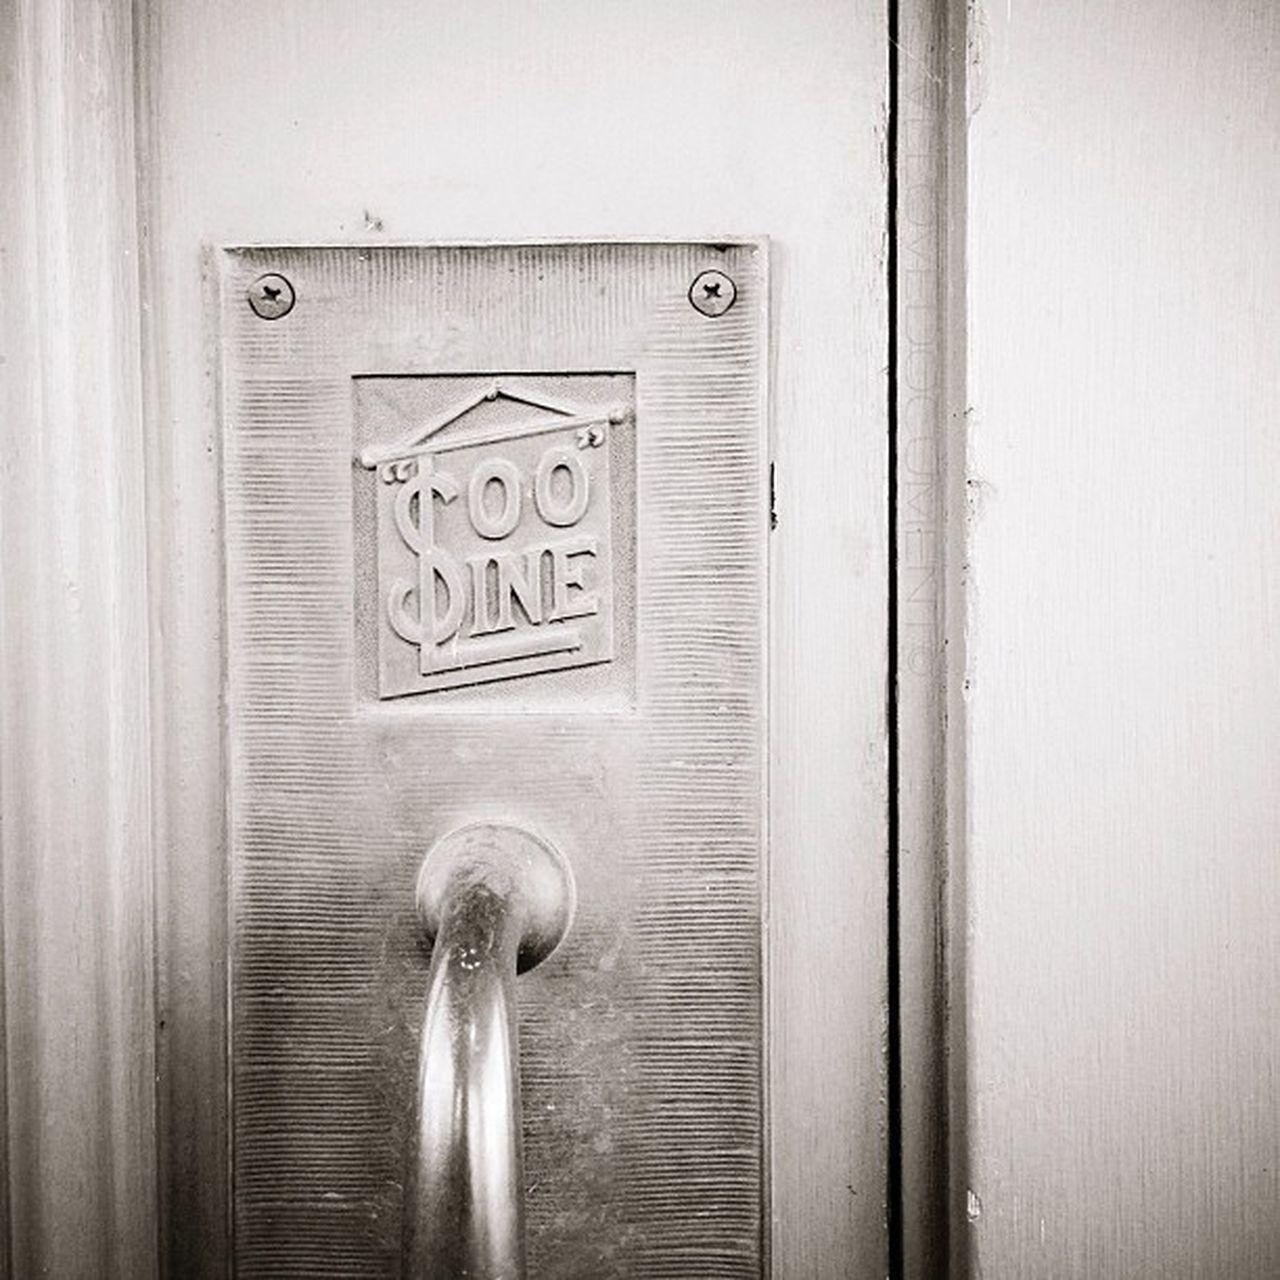 door, communication, metal, no people, close-up, wood - material, day, indoors